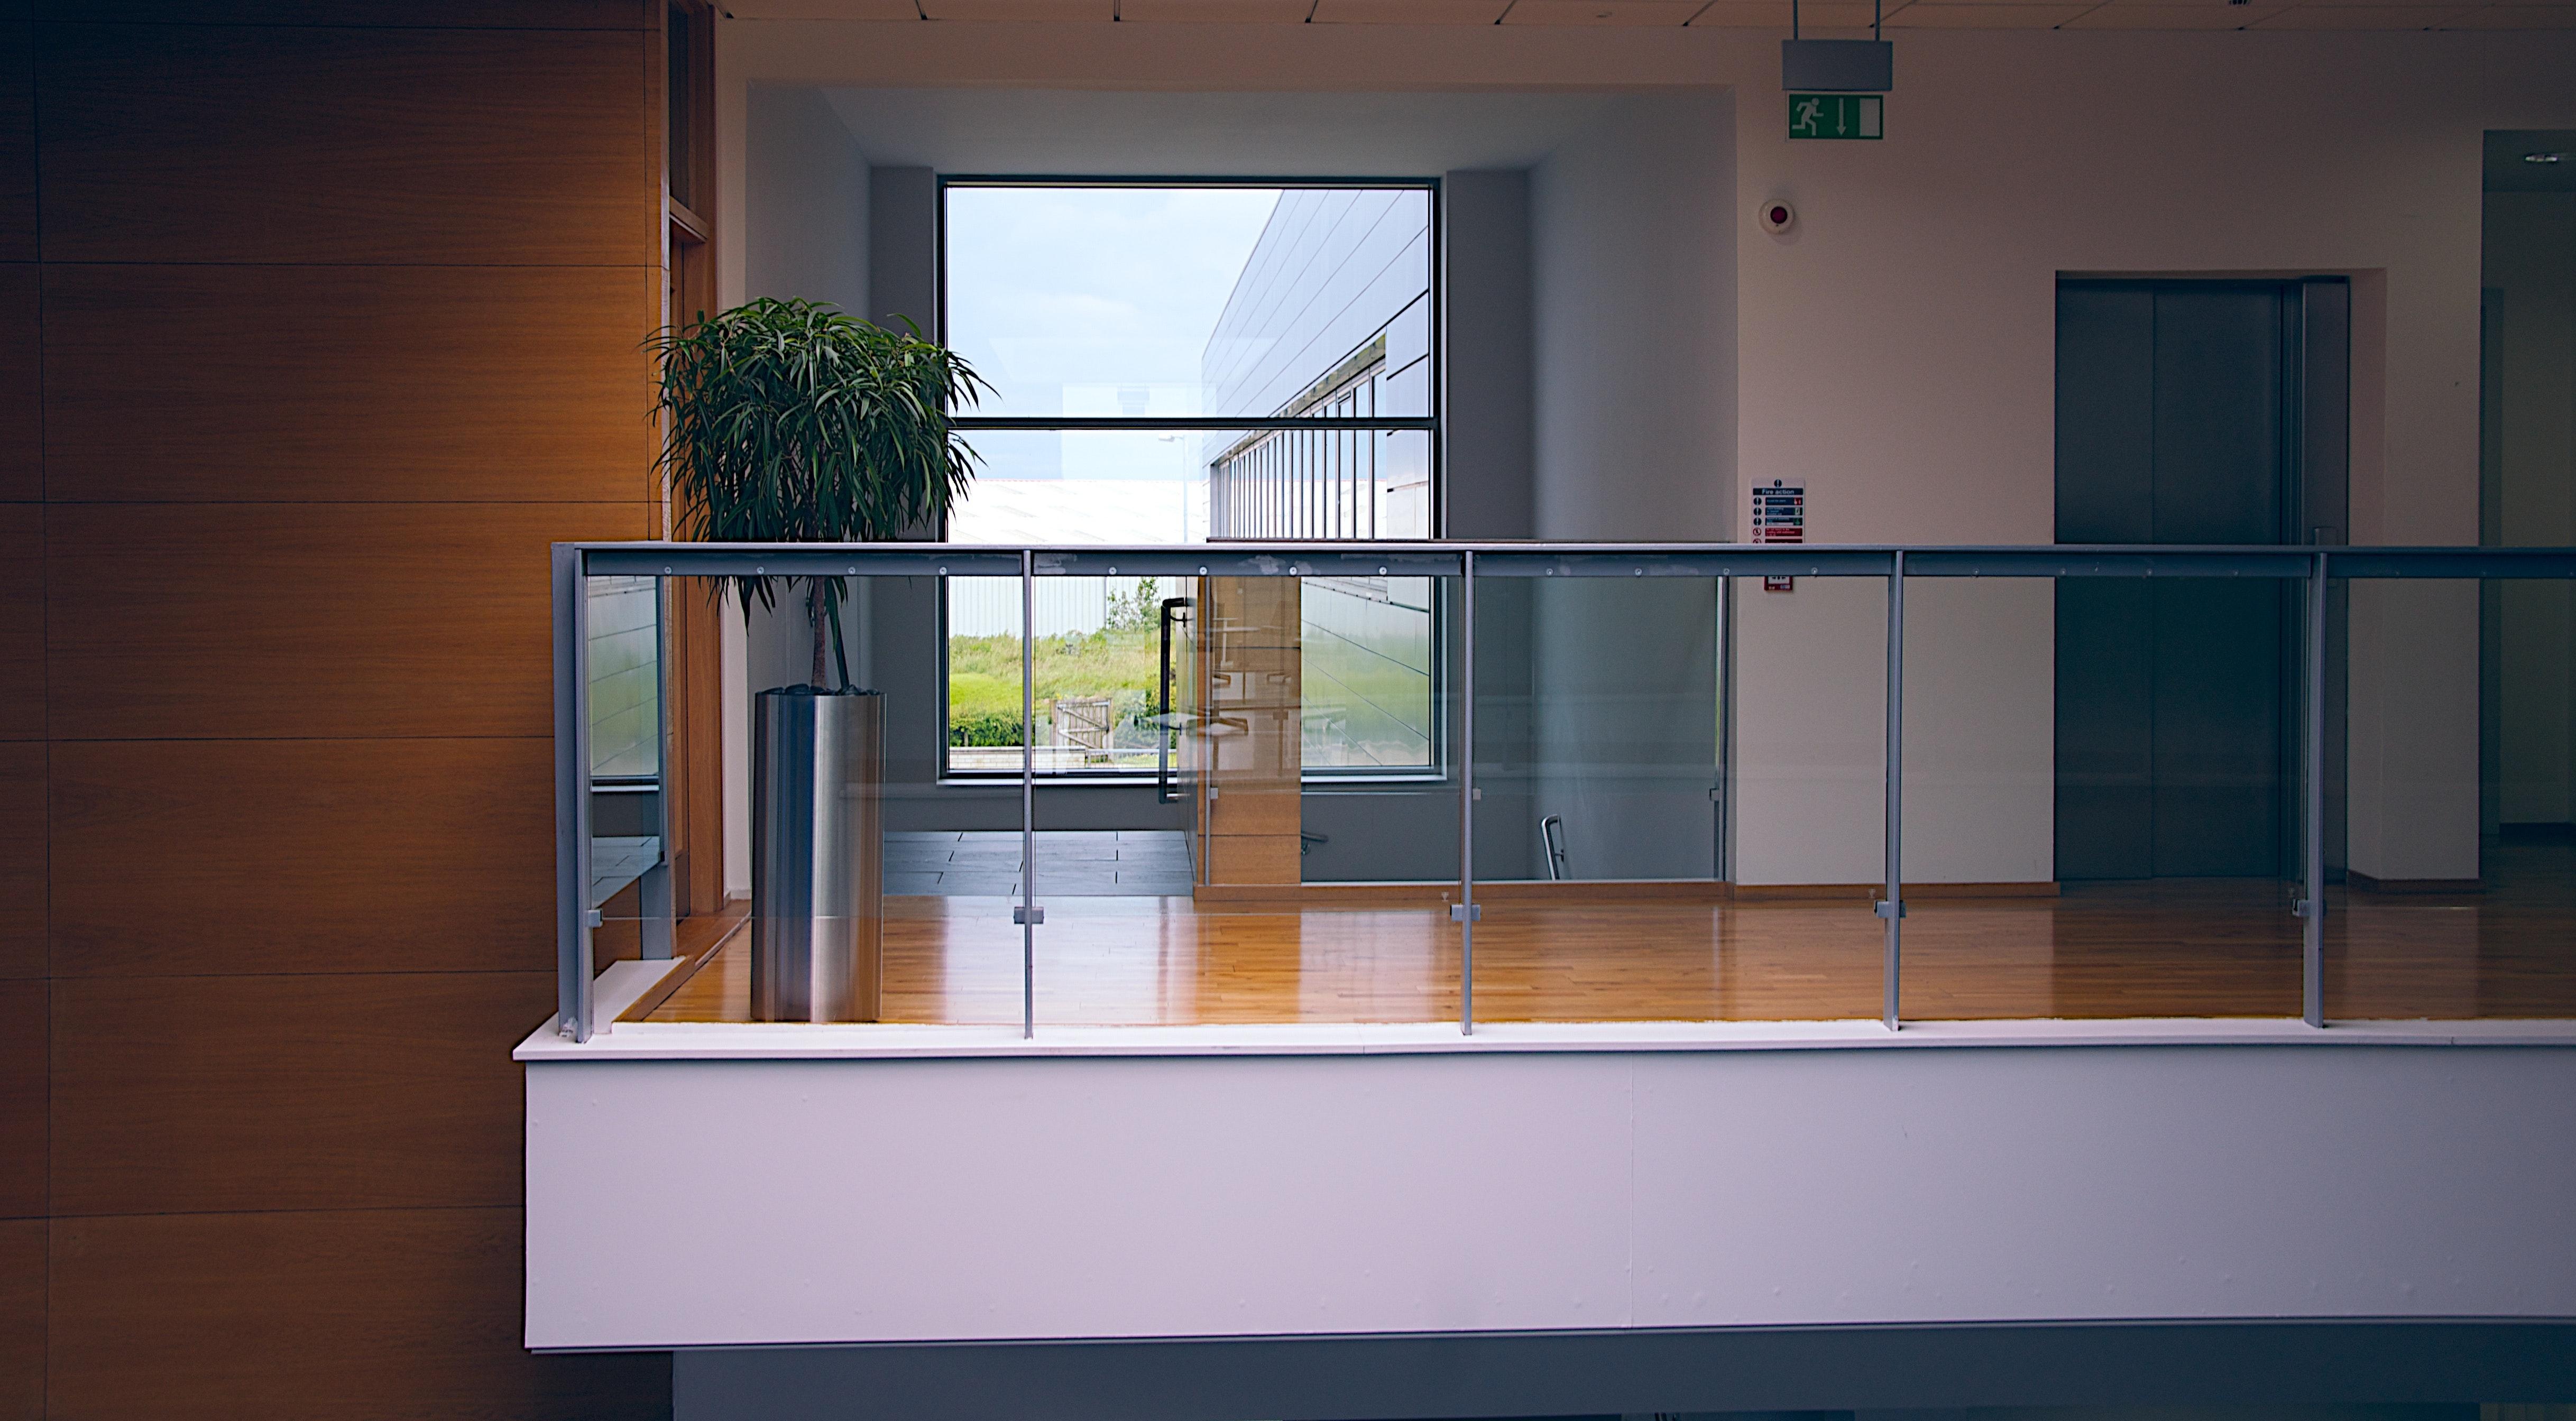 apartment-architectural-architecture-273